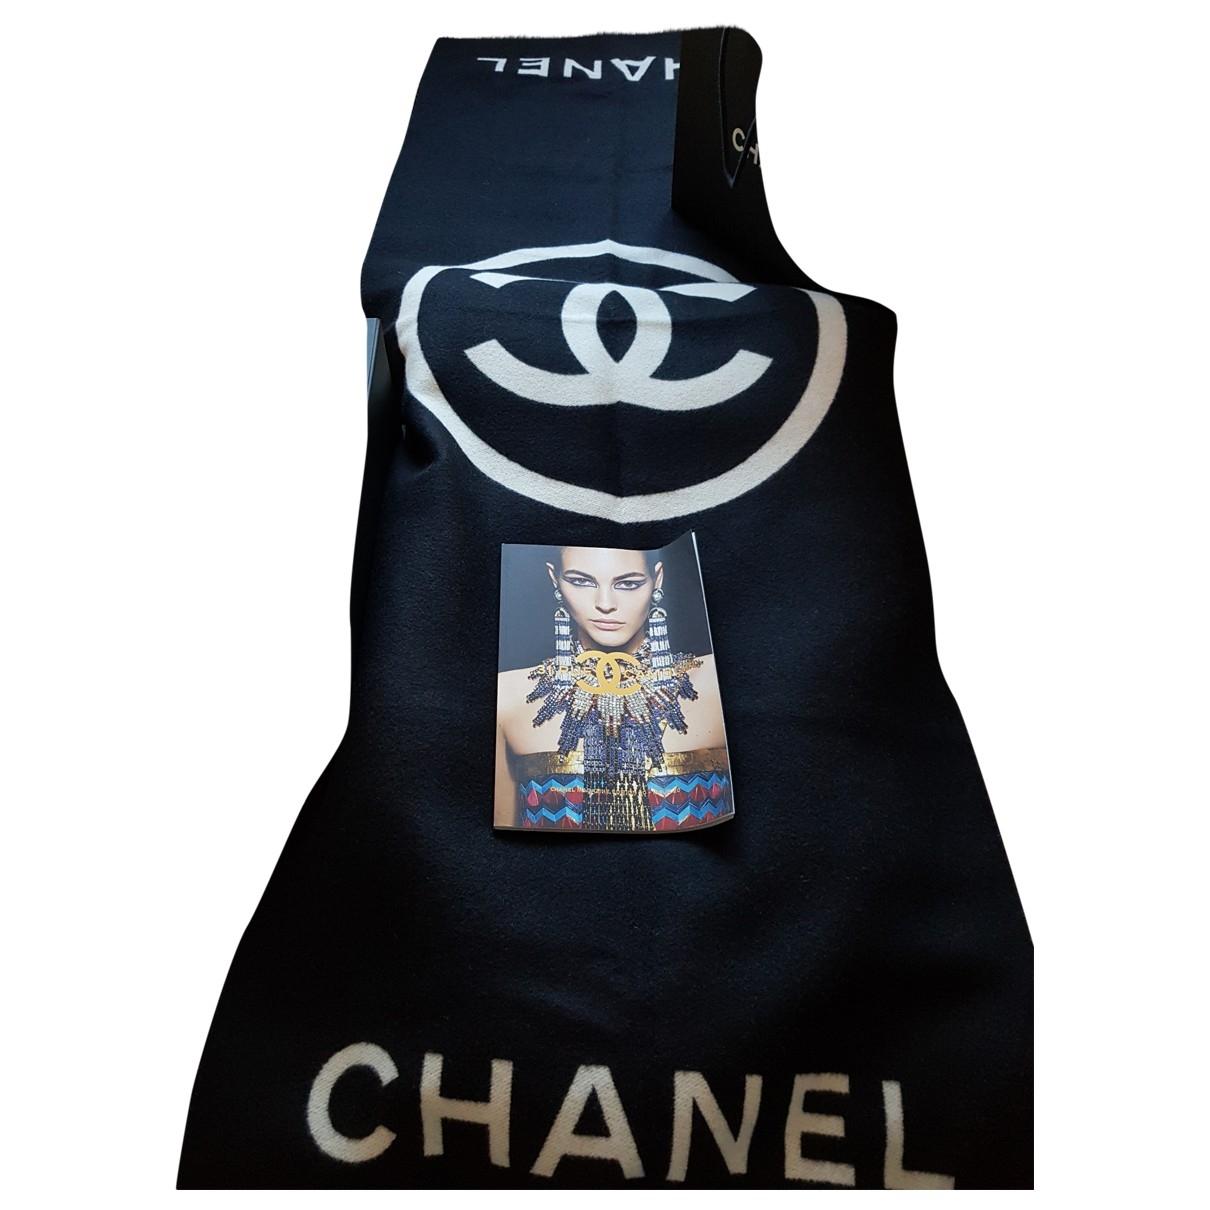 Chanel \N Schal in  Schwarz Kaschmir